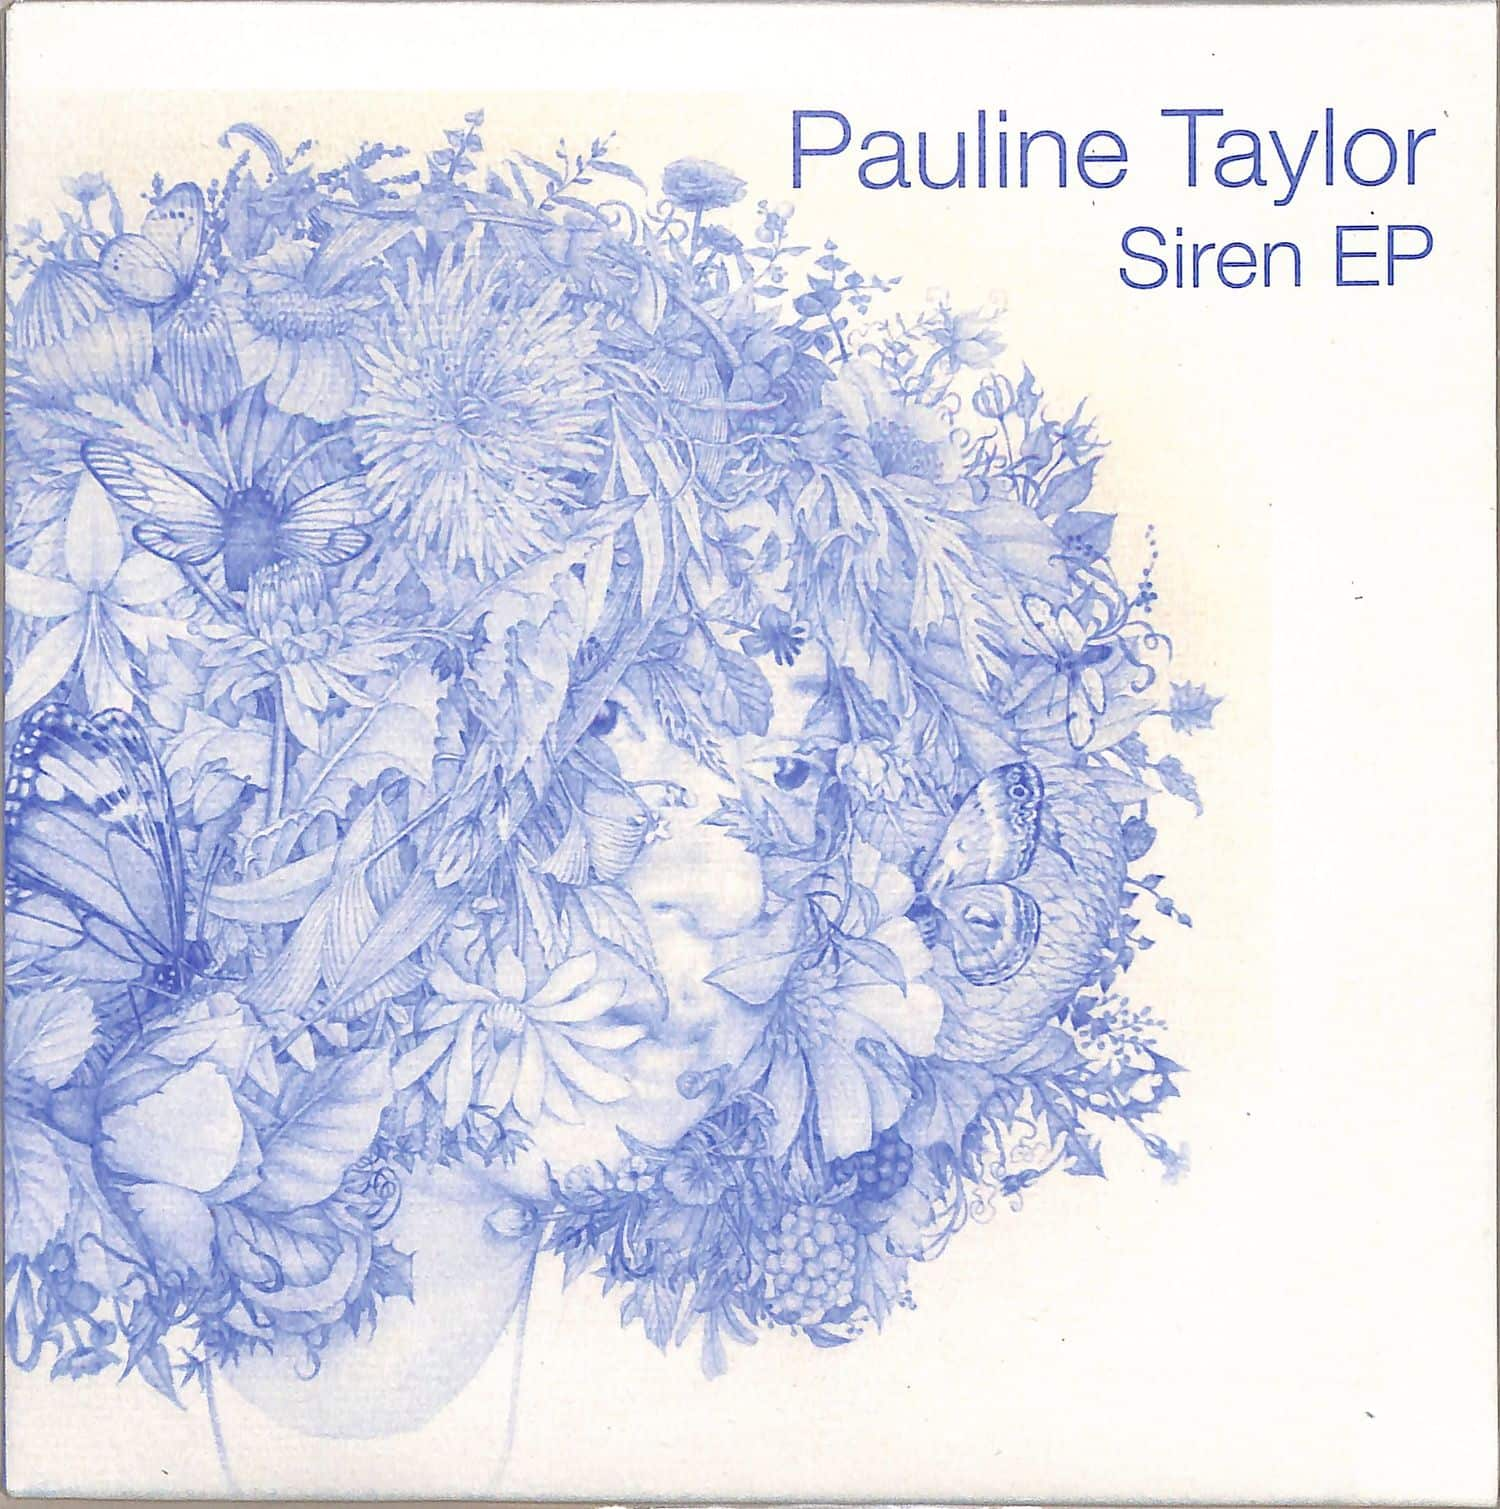 Pauline Taylor - SIREN EP